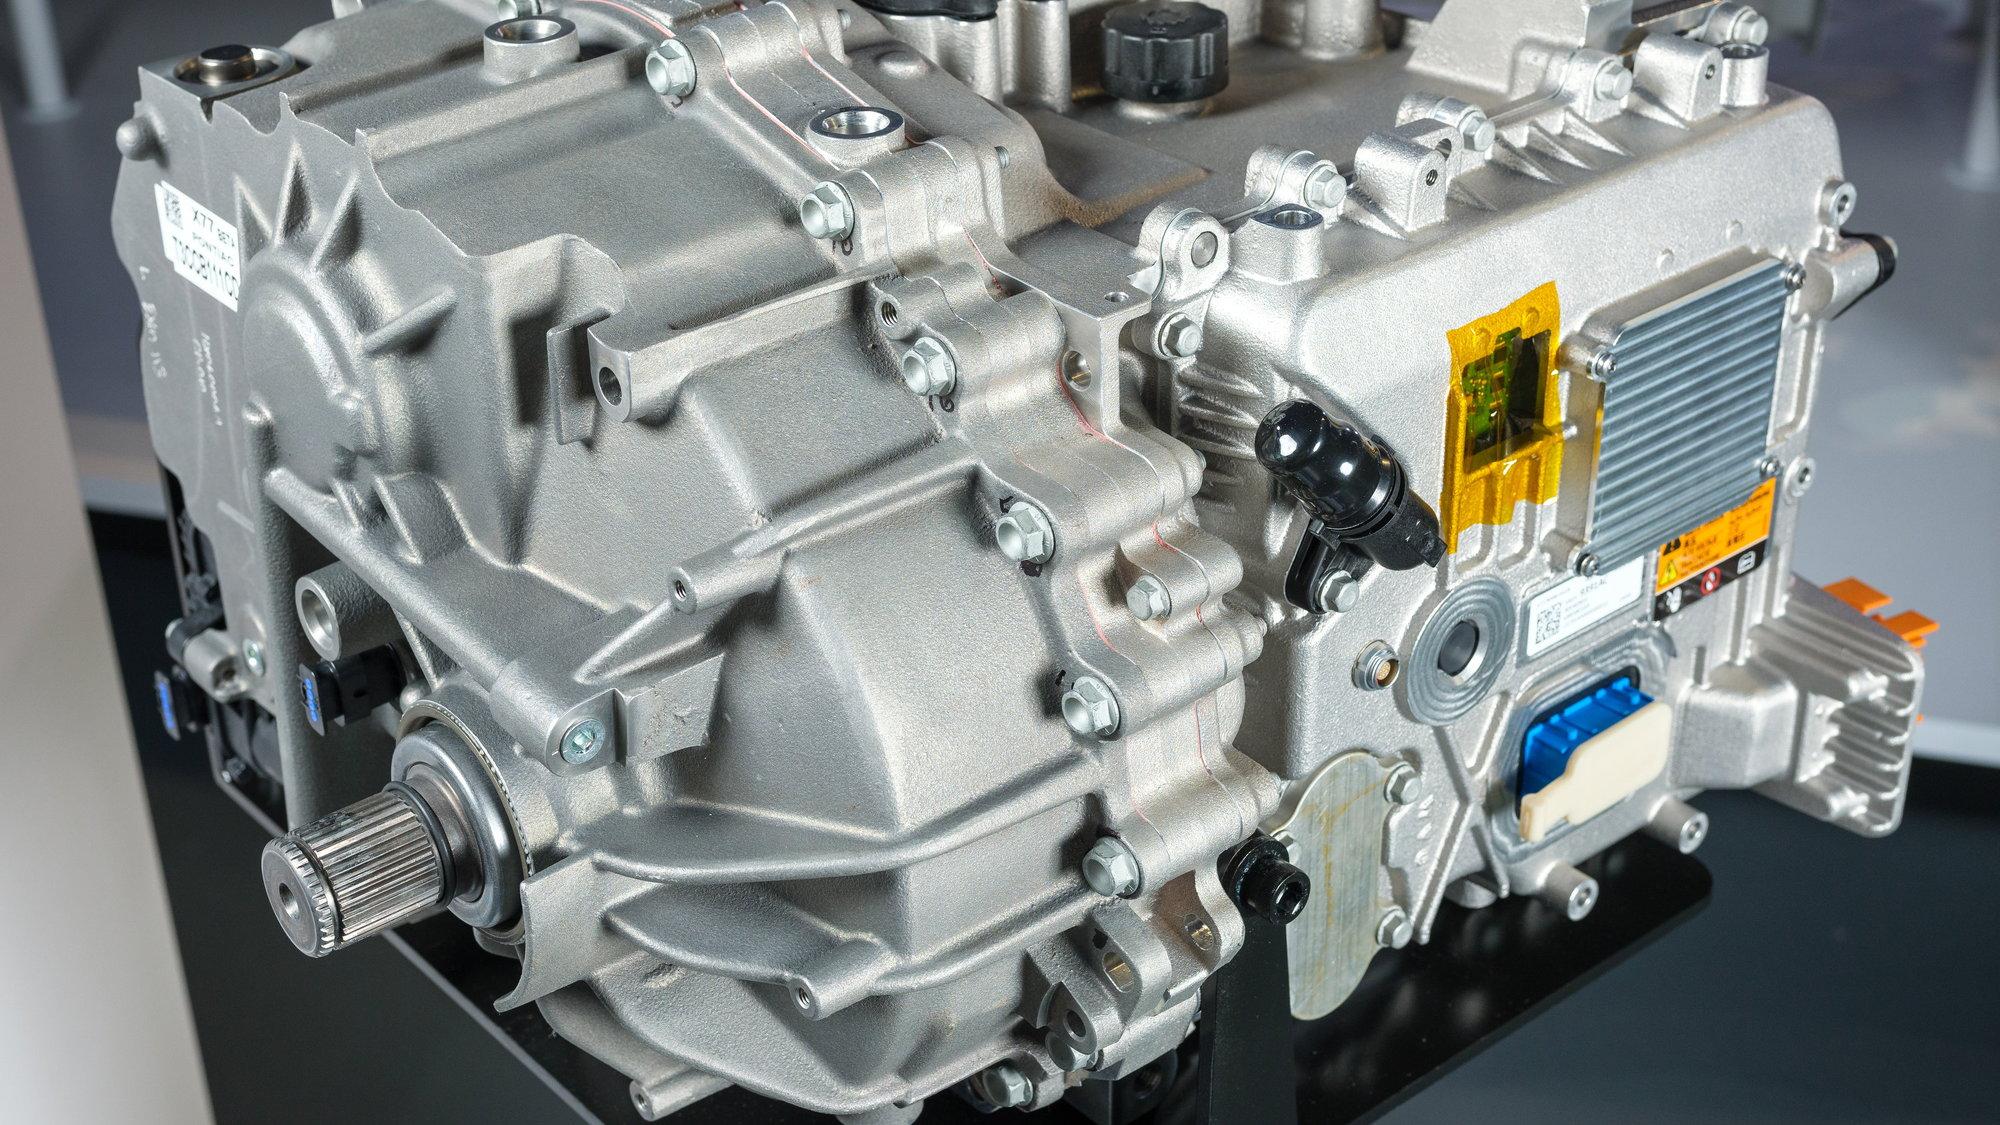 Motor for GM Ultium propulsion system